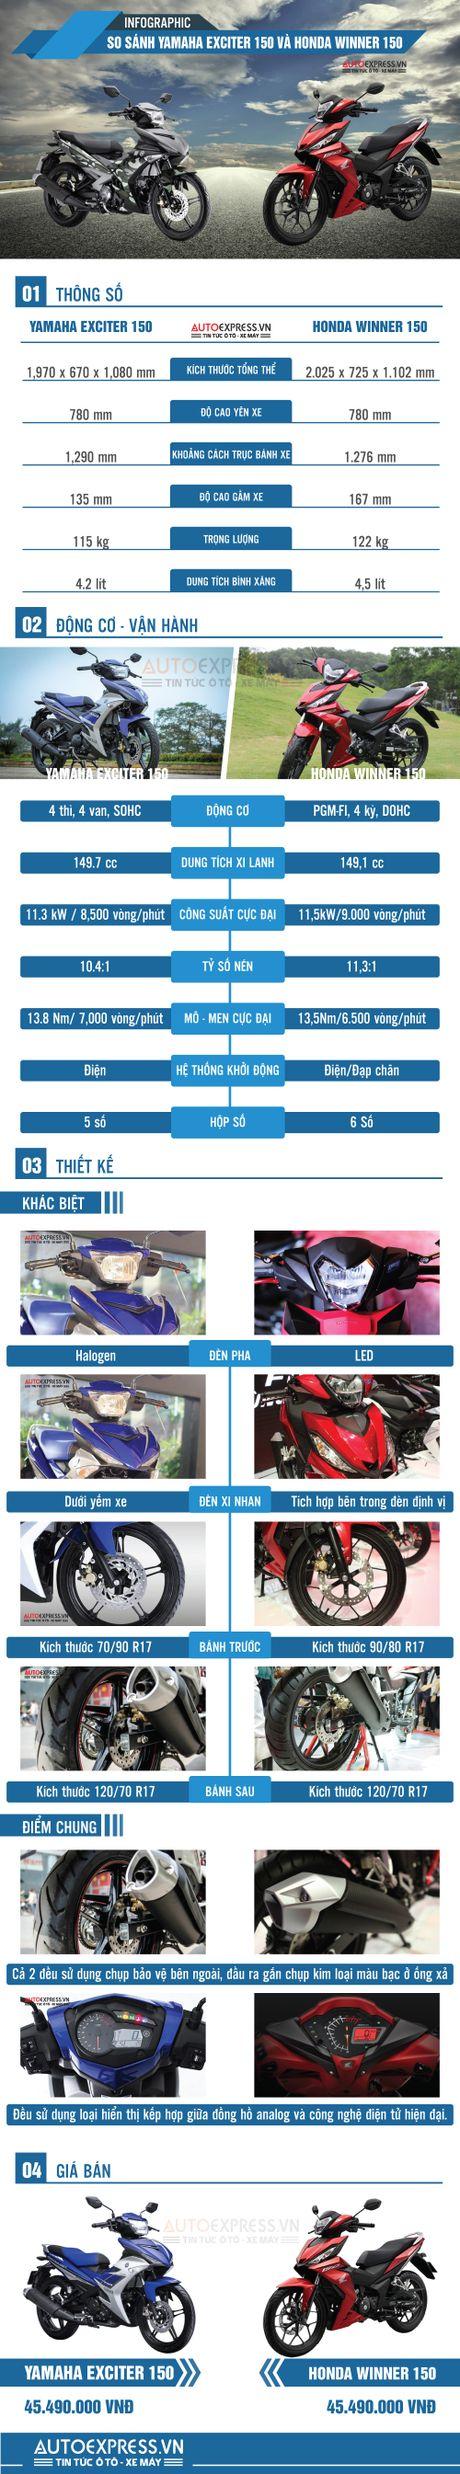 Chon Honda Winner 150 hay Yamaha Exciter 150 khi mua xe con tay co nho? - Anh 1